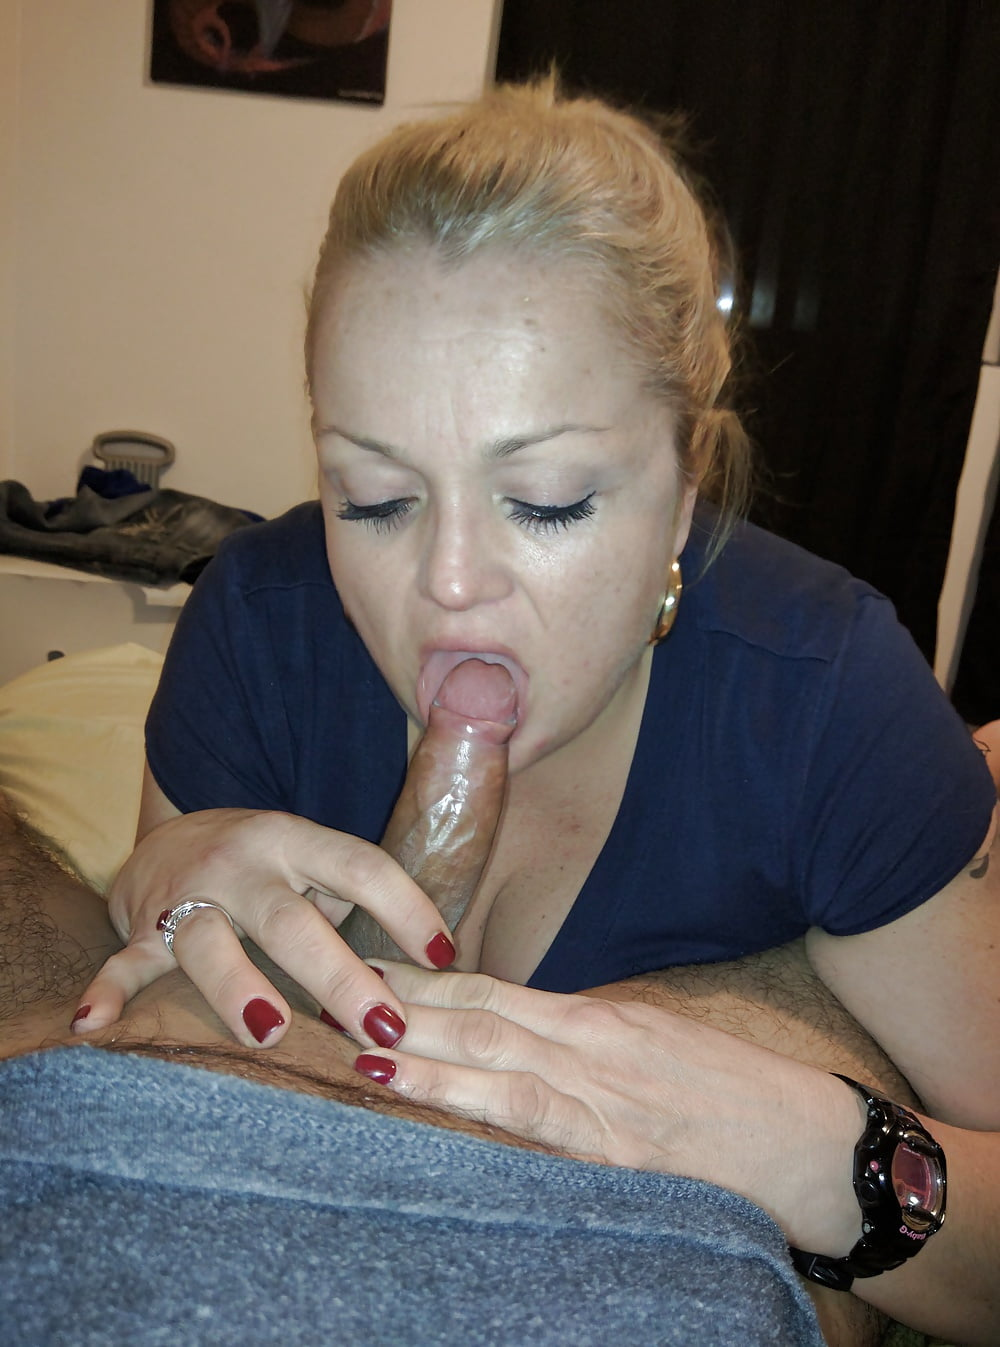 Mexicana enmascarada cogida en el sillon del sexo - 3 2